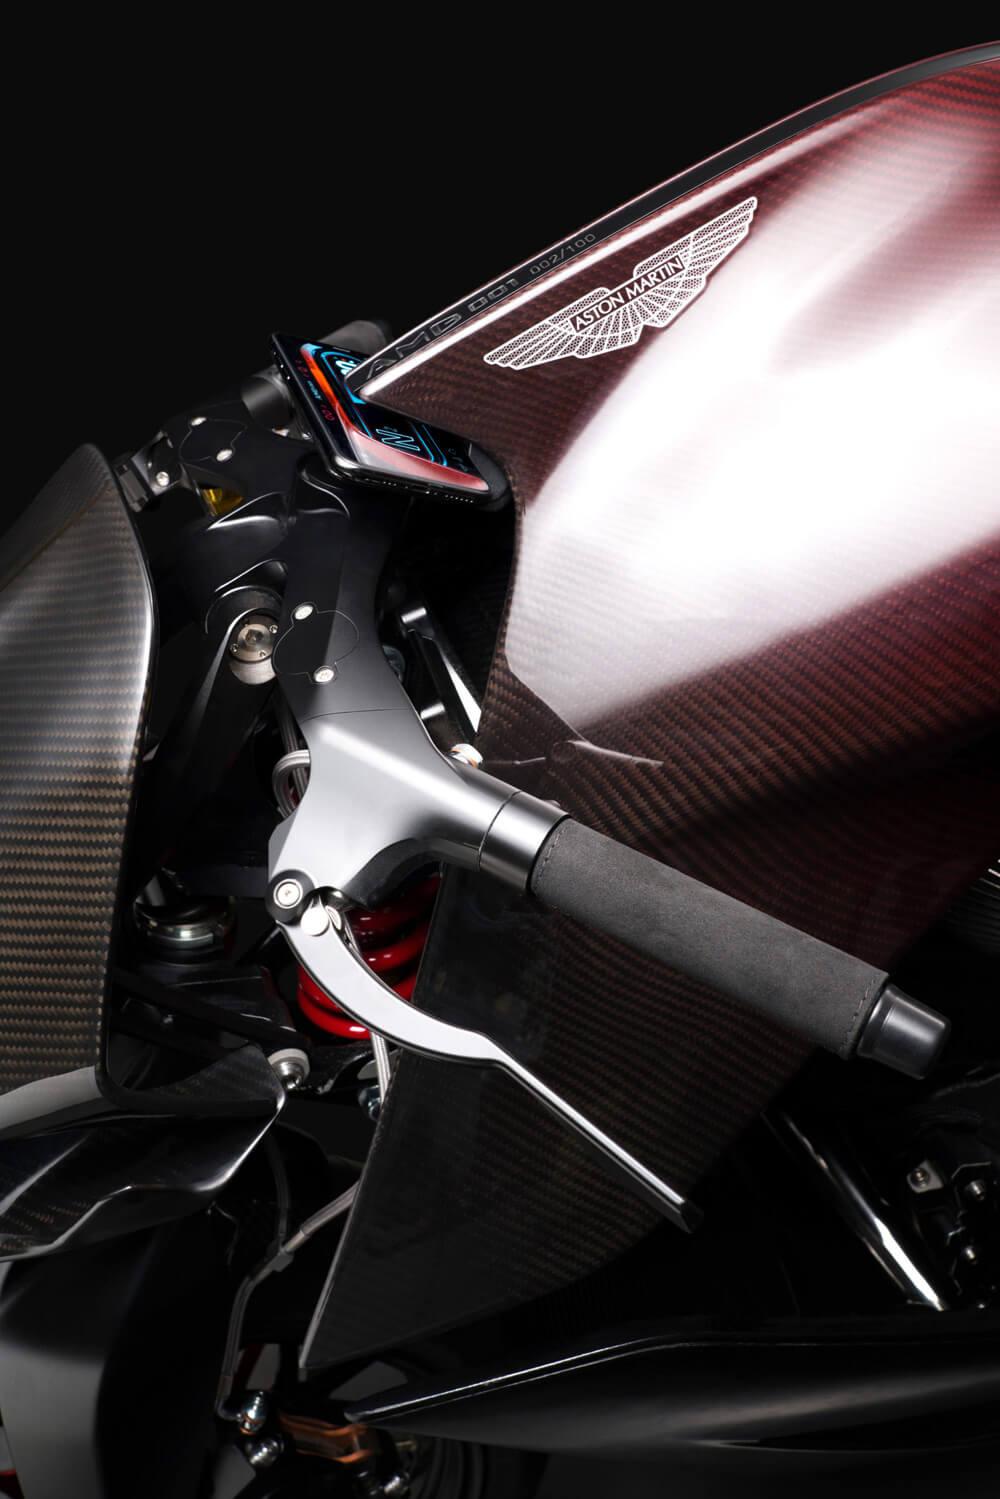 Aston Martin Brough Superior AMB 001 Motorcyle Red Carbon Fiber Details